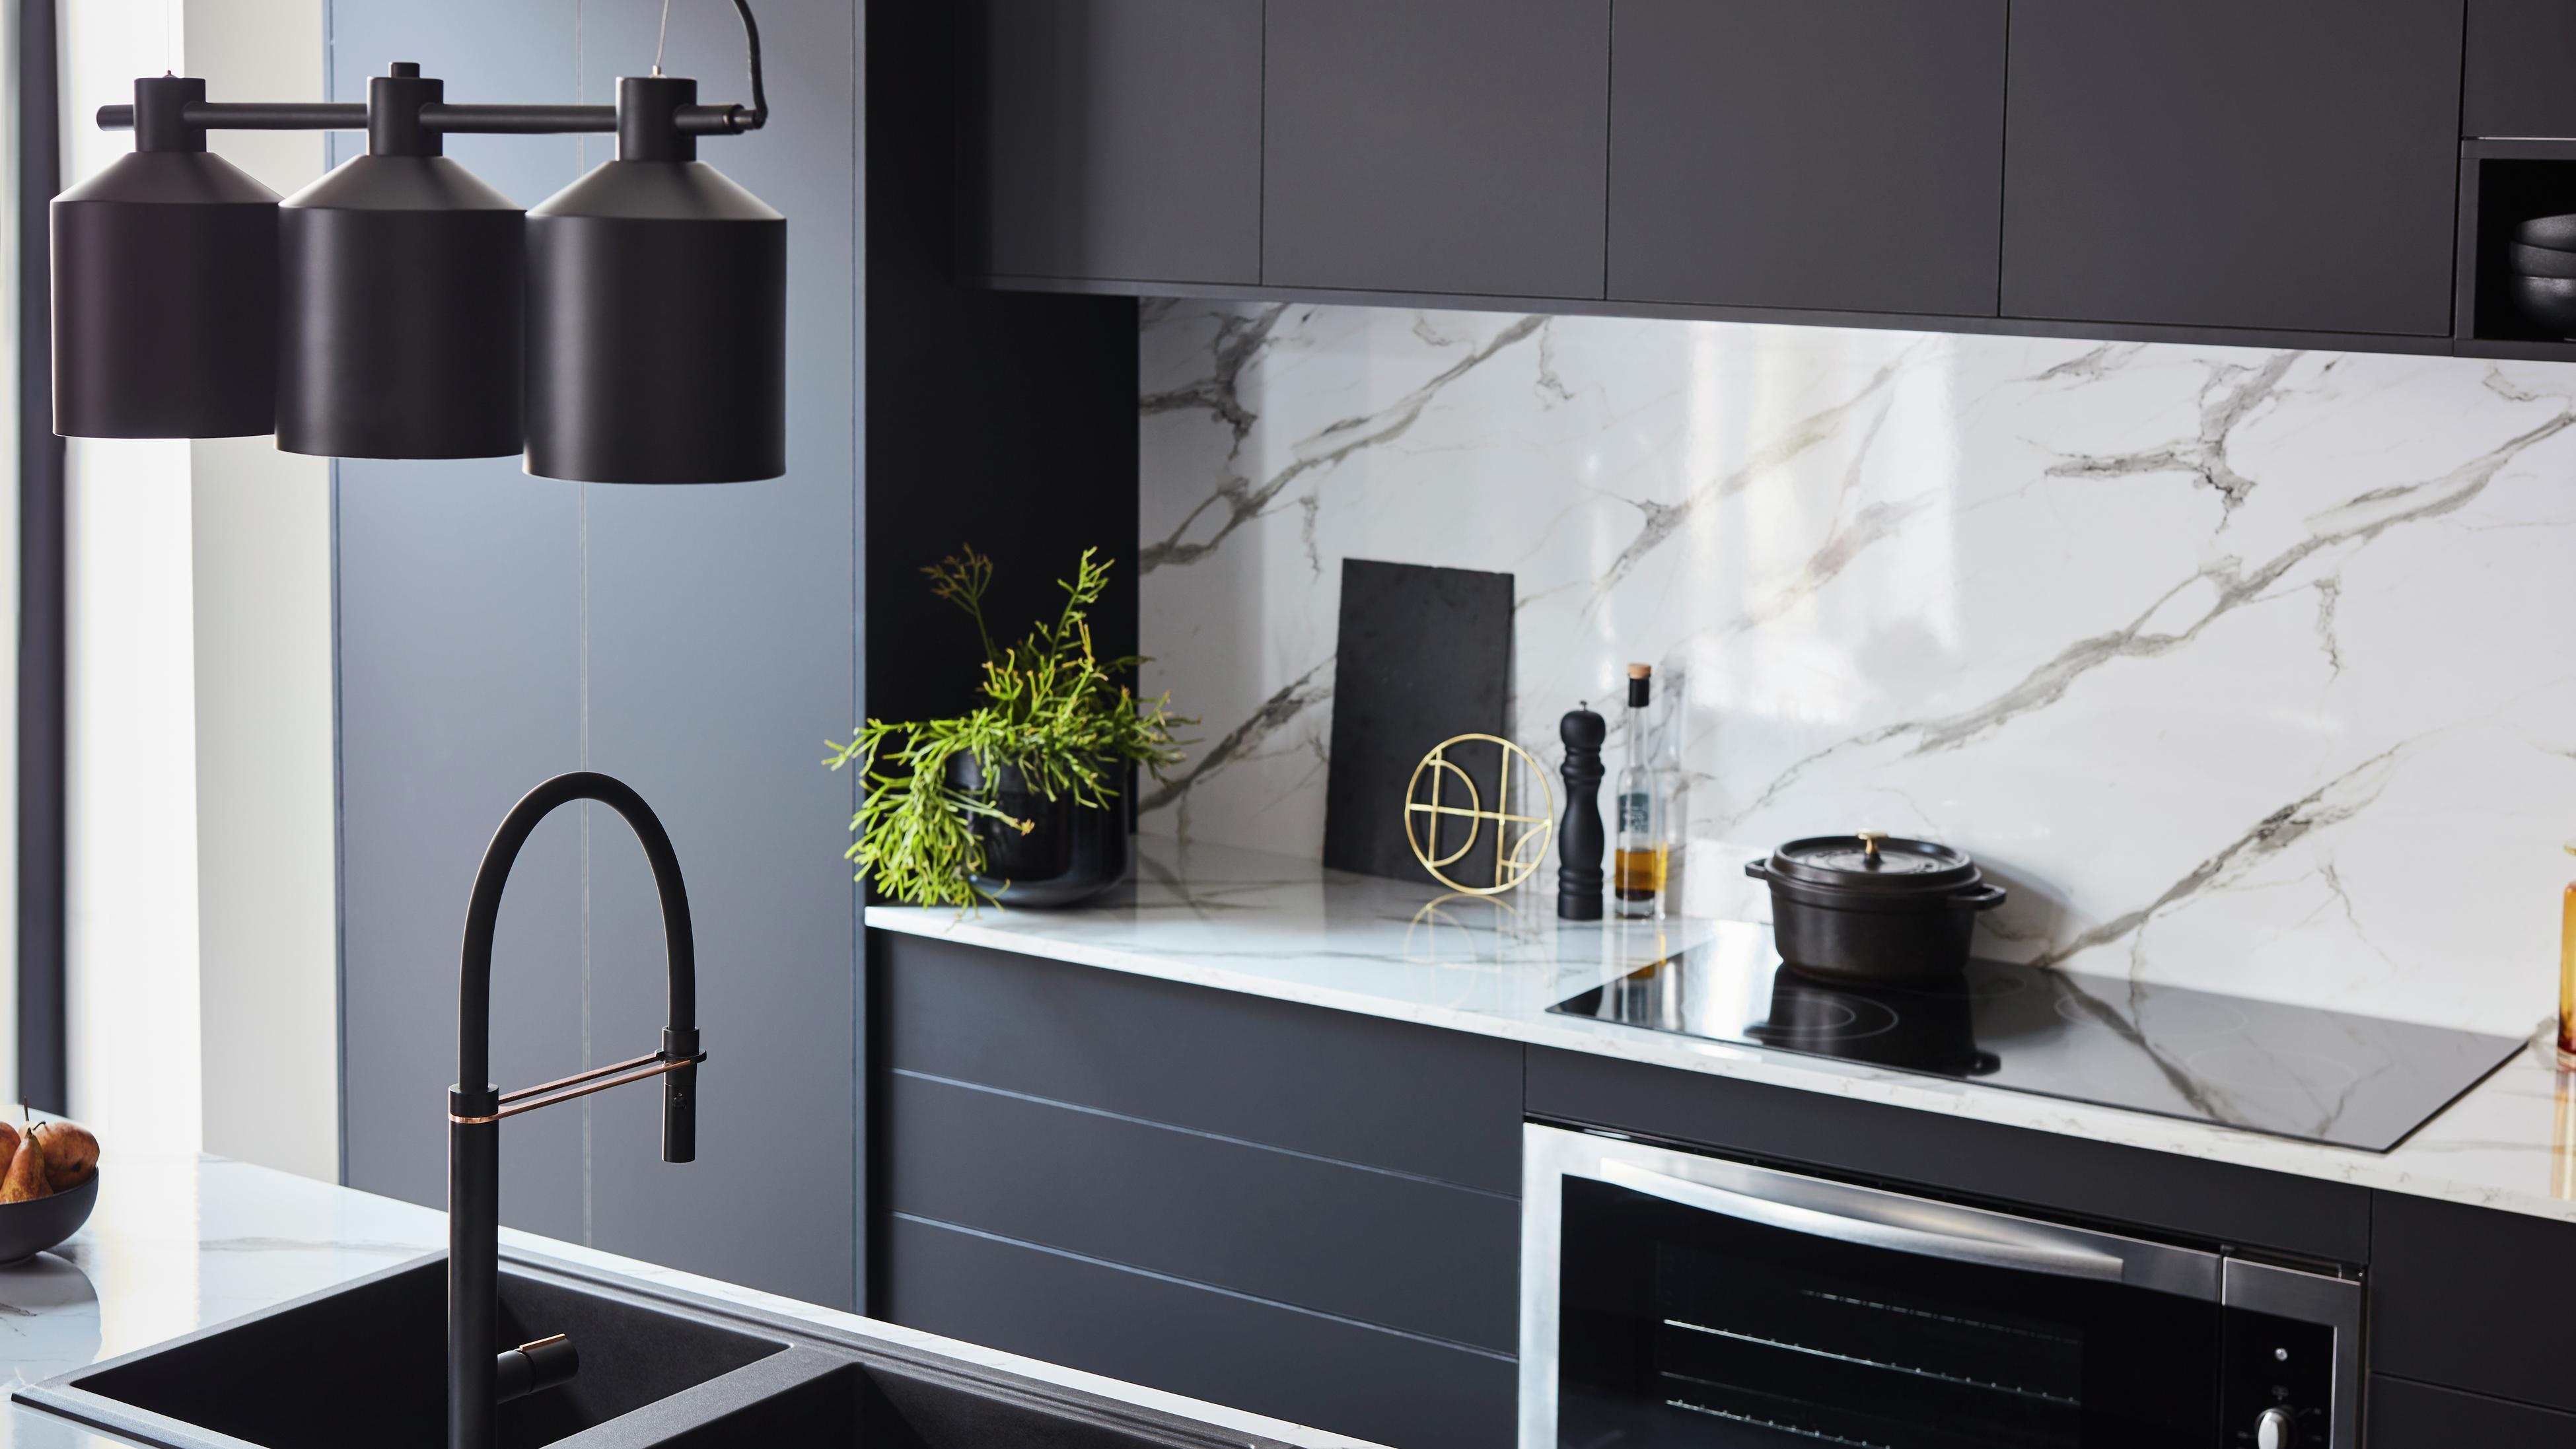 Monochromatic kitchen featuring marble splashback and black sink.